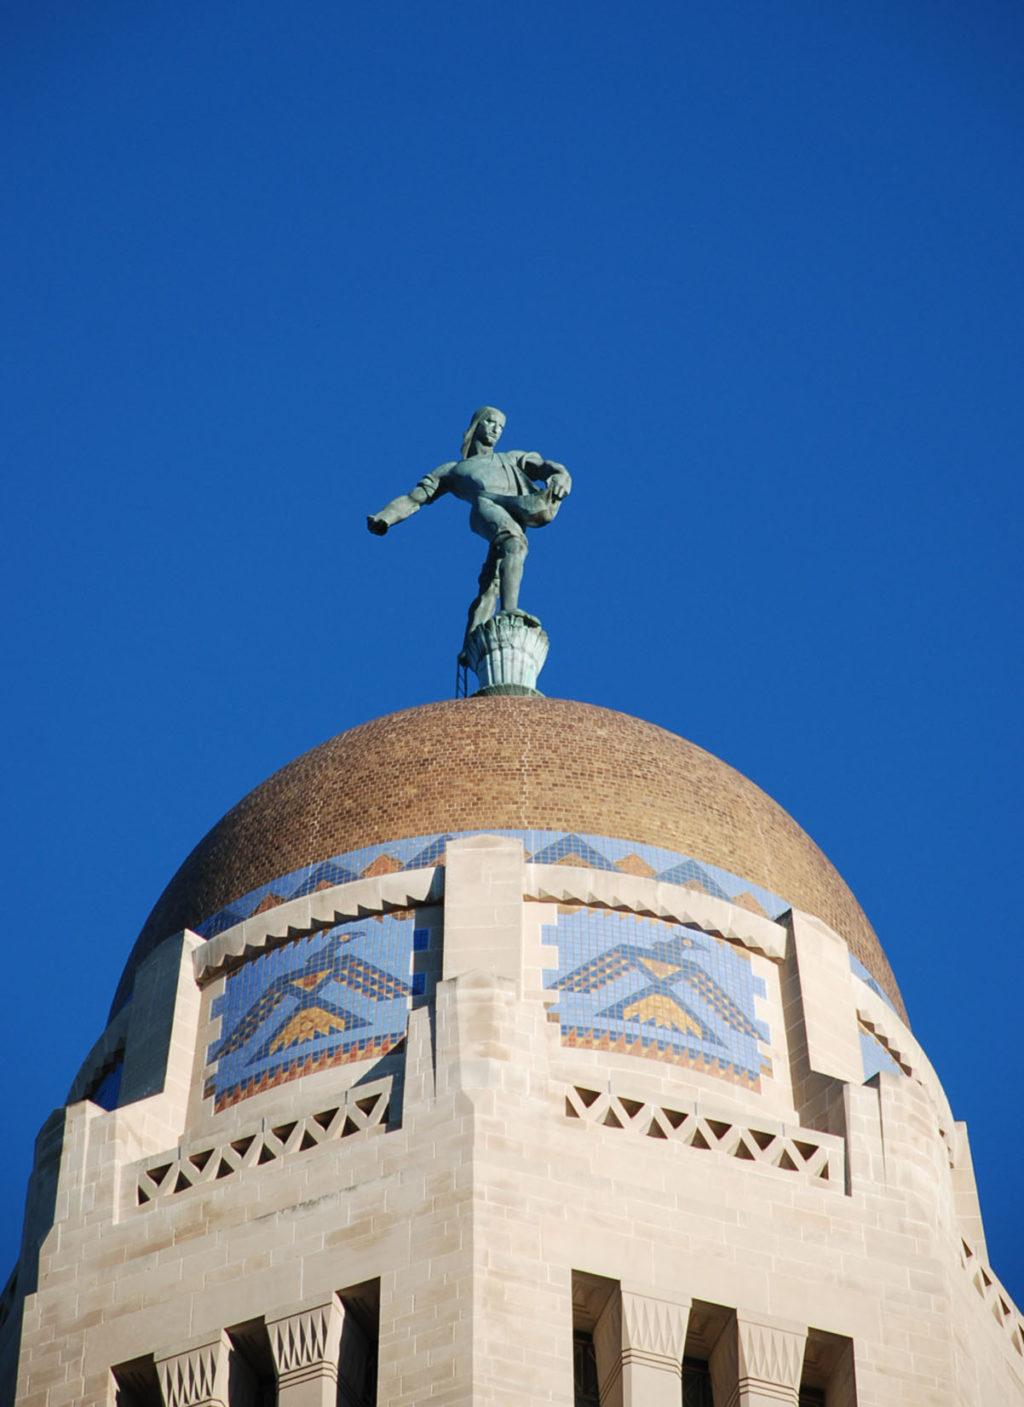 Thunderbird beneath gold dome